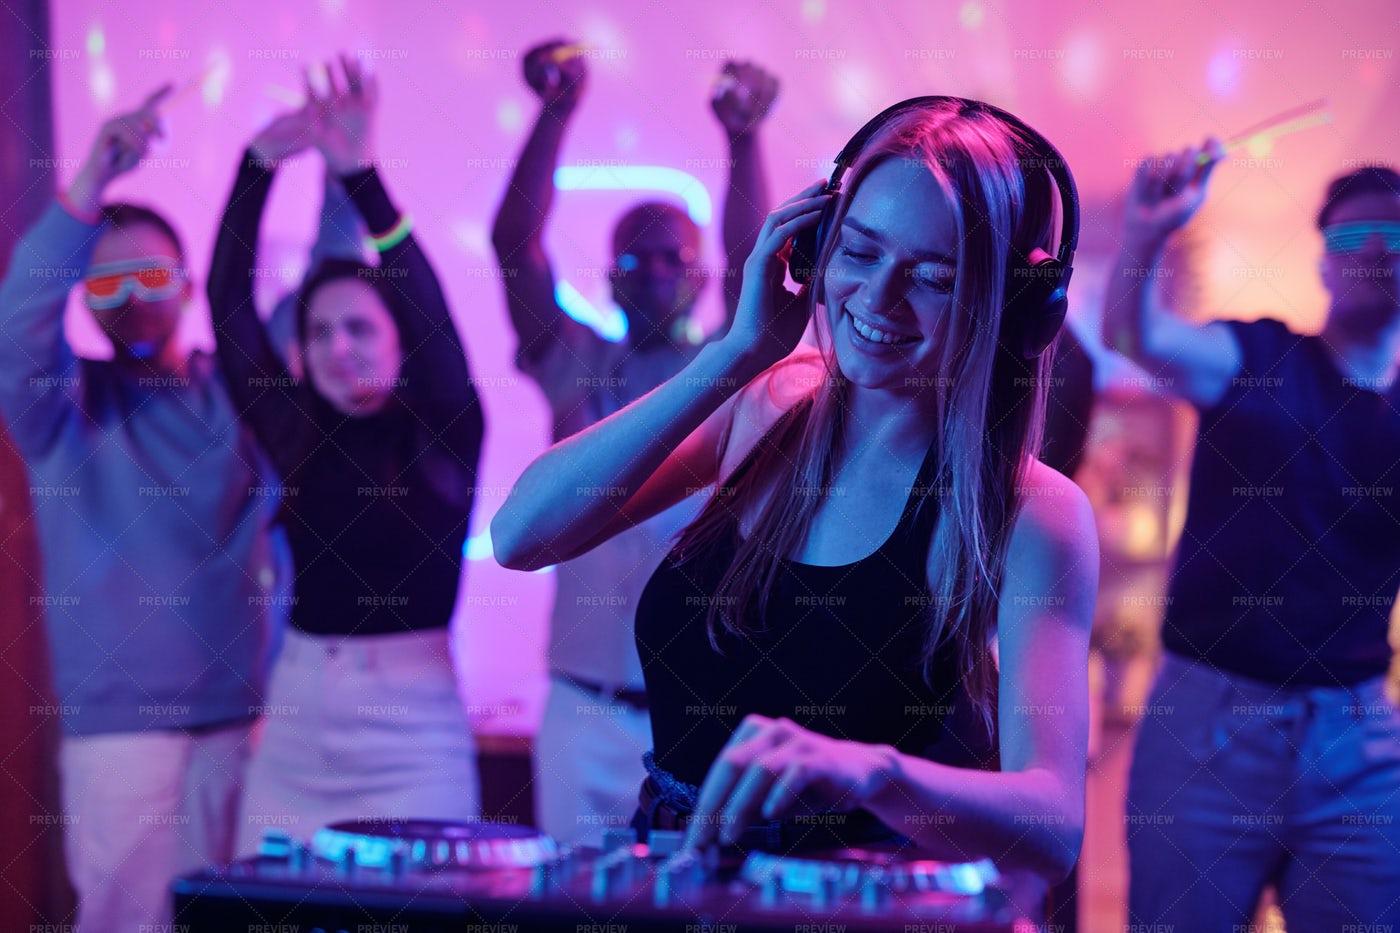 Girl With Long Blond Hair DJing: Stock Photos